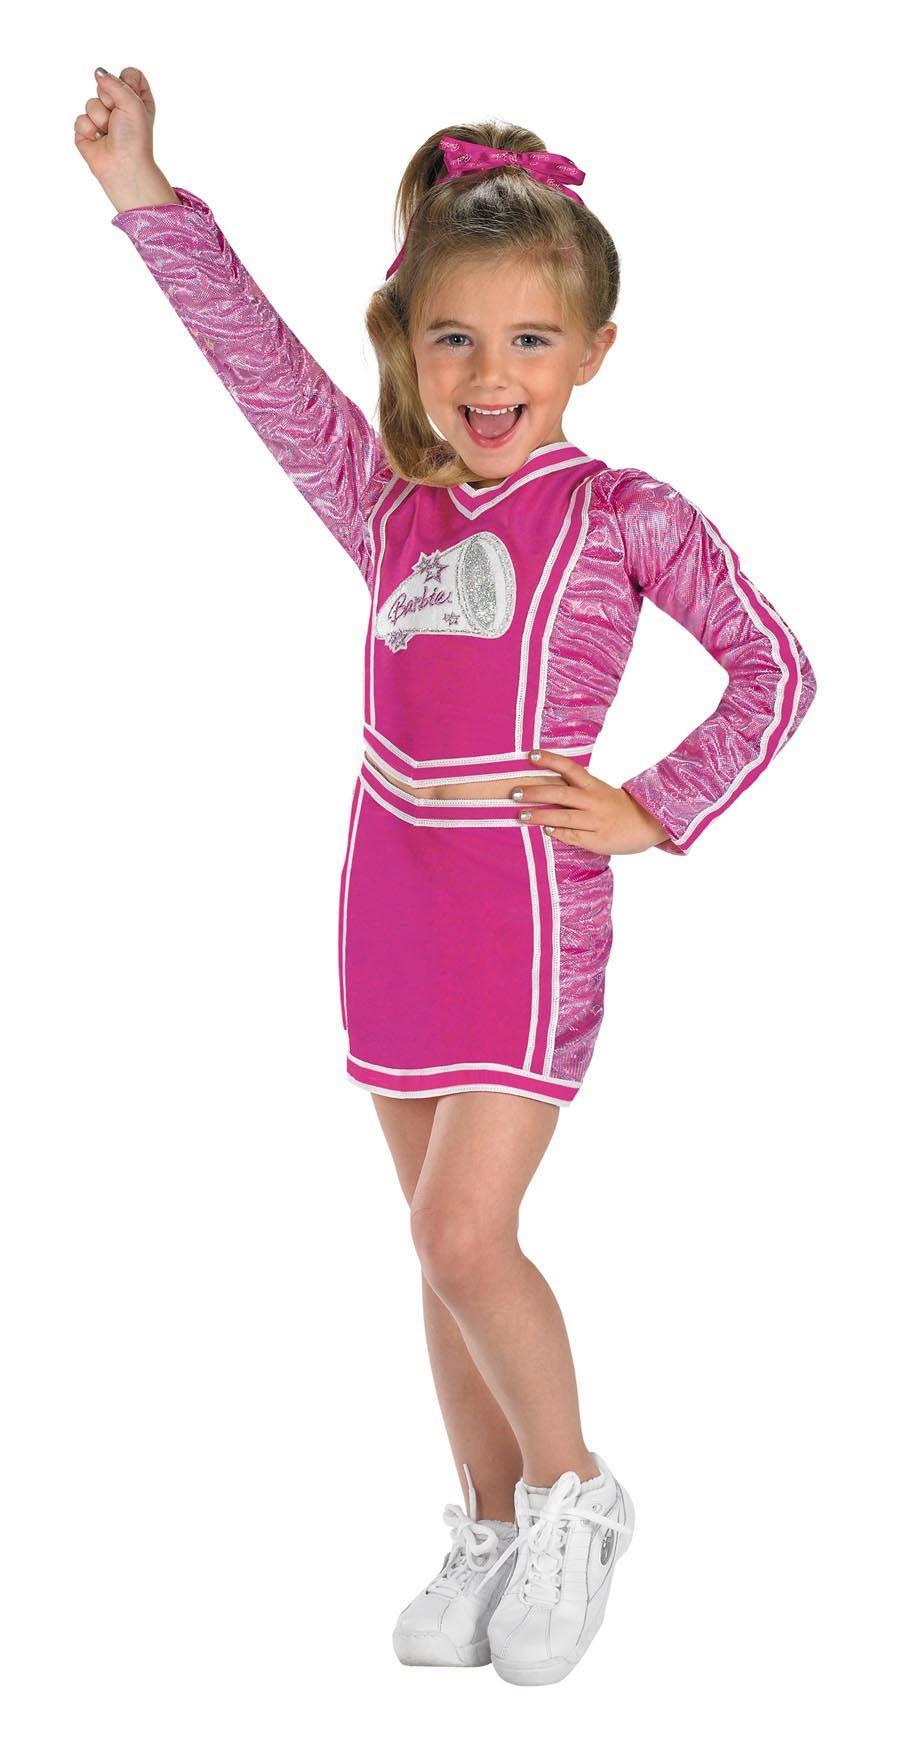 Cheer Costumes For Girls Barbie Varsity Cheerleader Costume Barbie Costumes Girls Cheerleader Costume Barbie Costume Cheerleader Costume